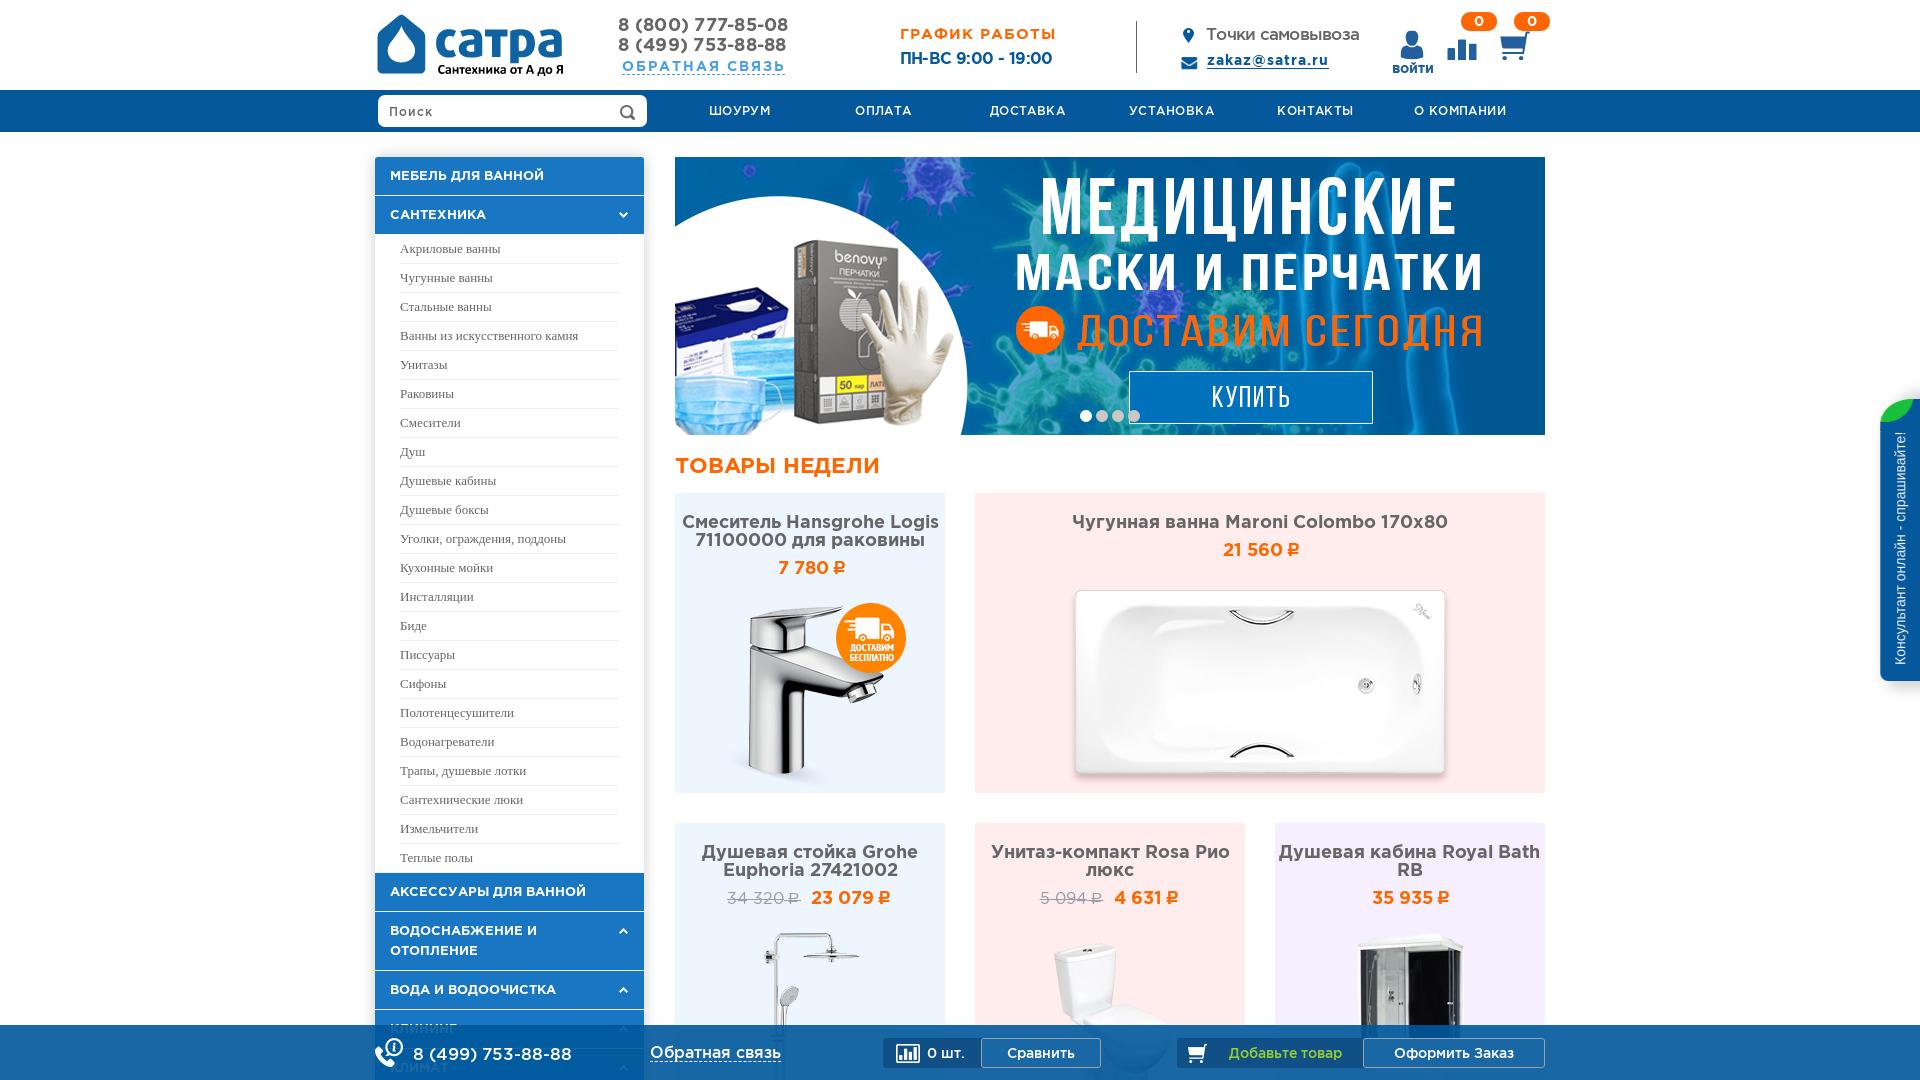 satra.ru website